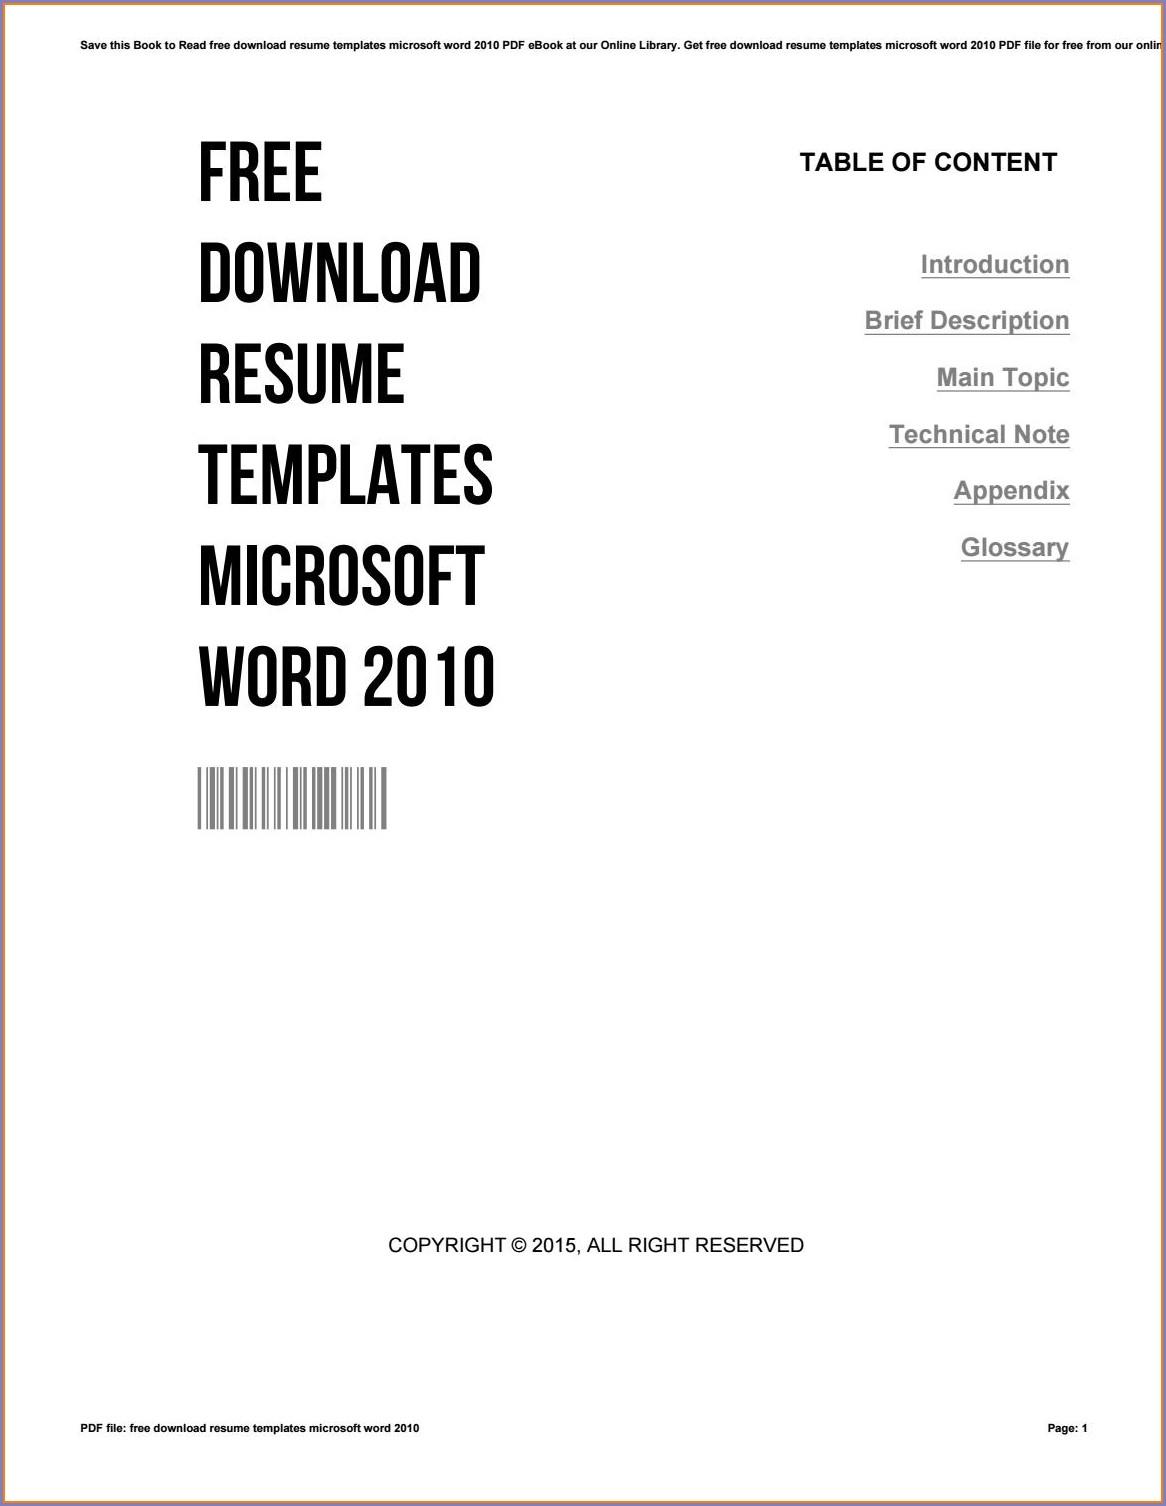 Microsoft Word 2010 Free Resume Templates